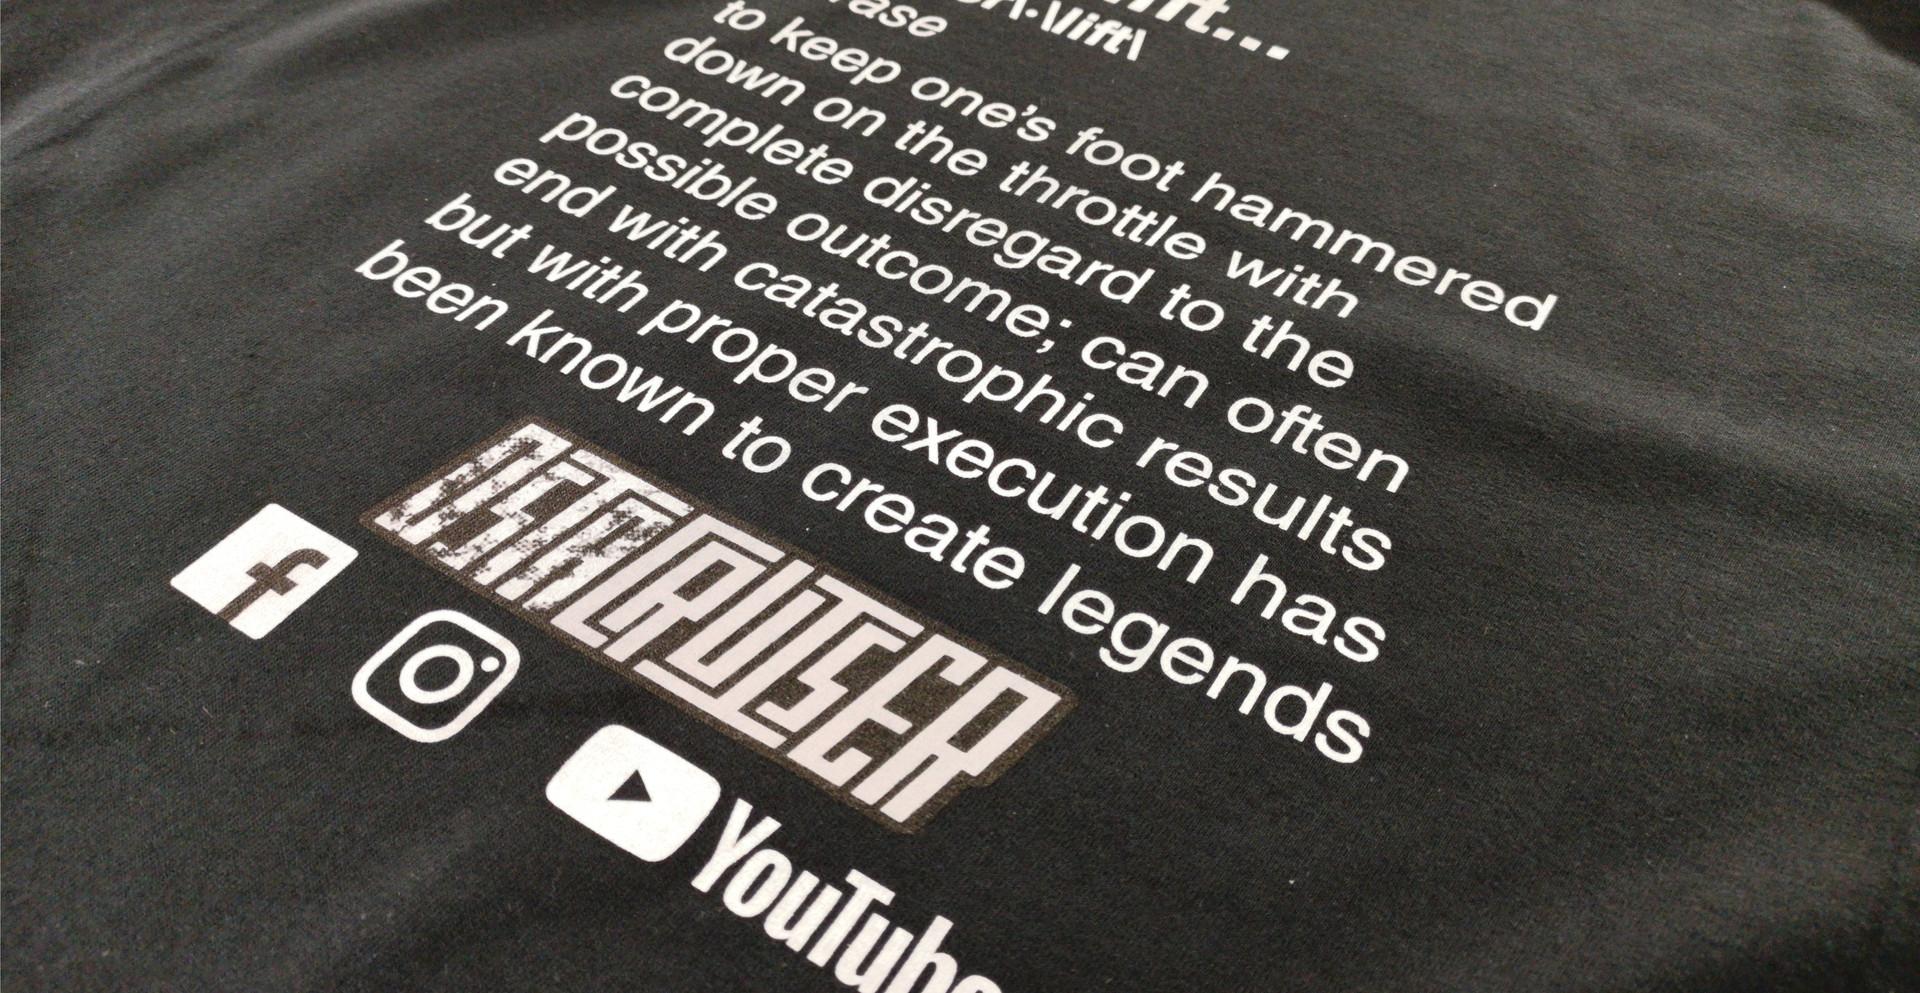 Ostacruiser_NeverLiftShirts.jpg